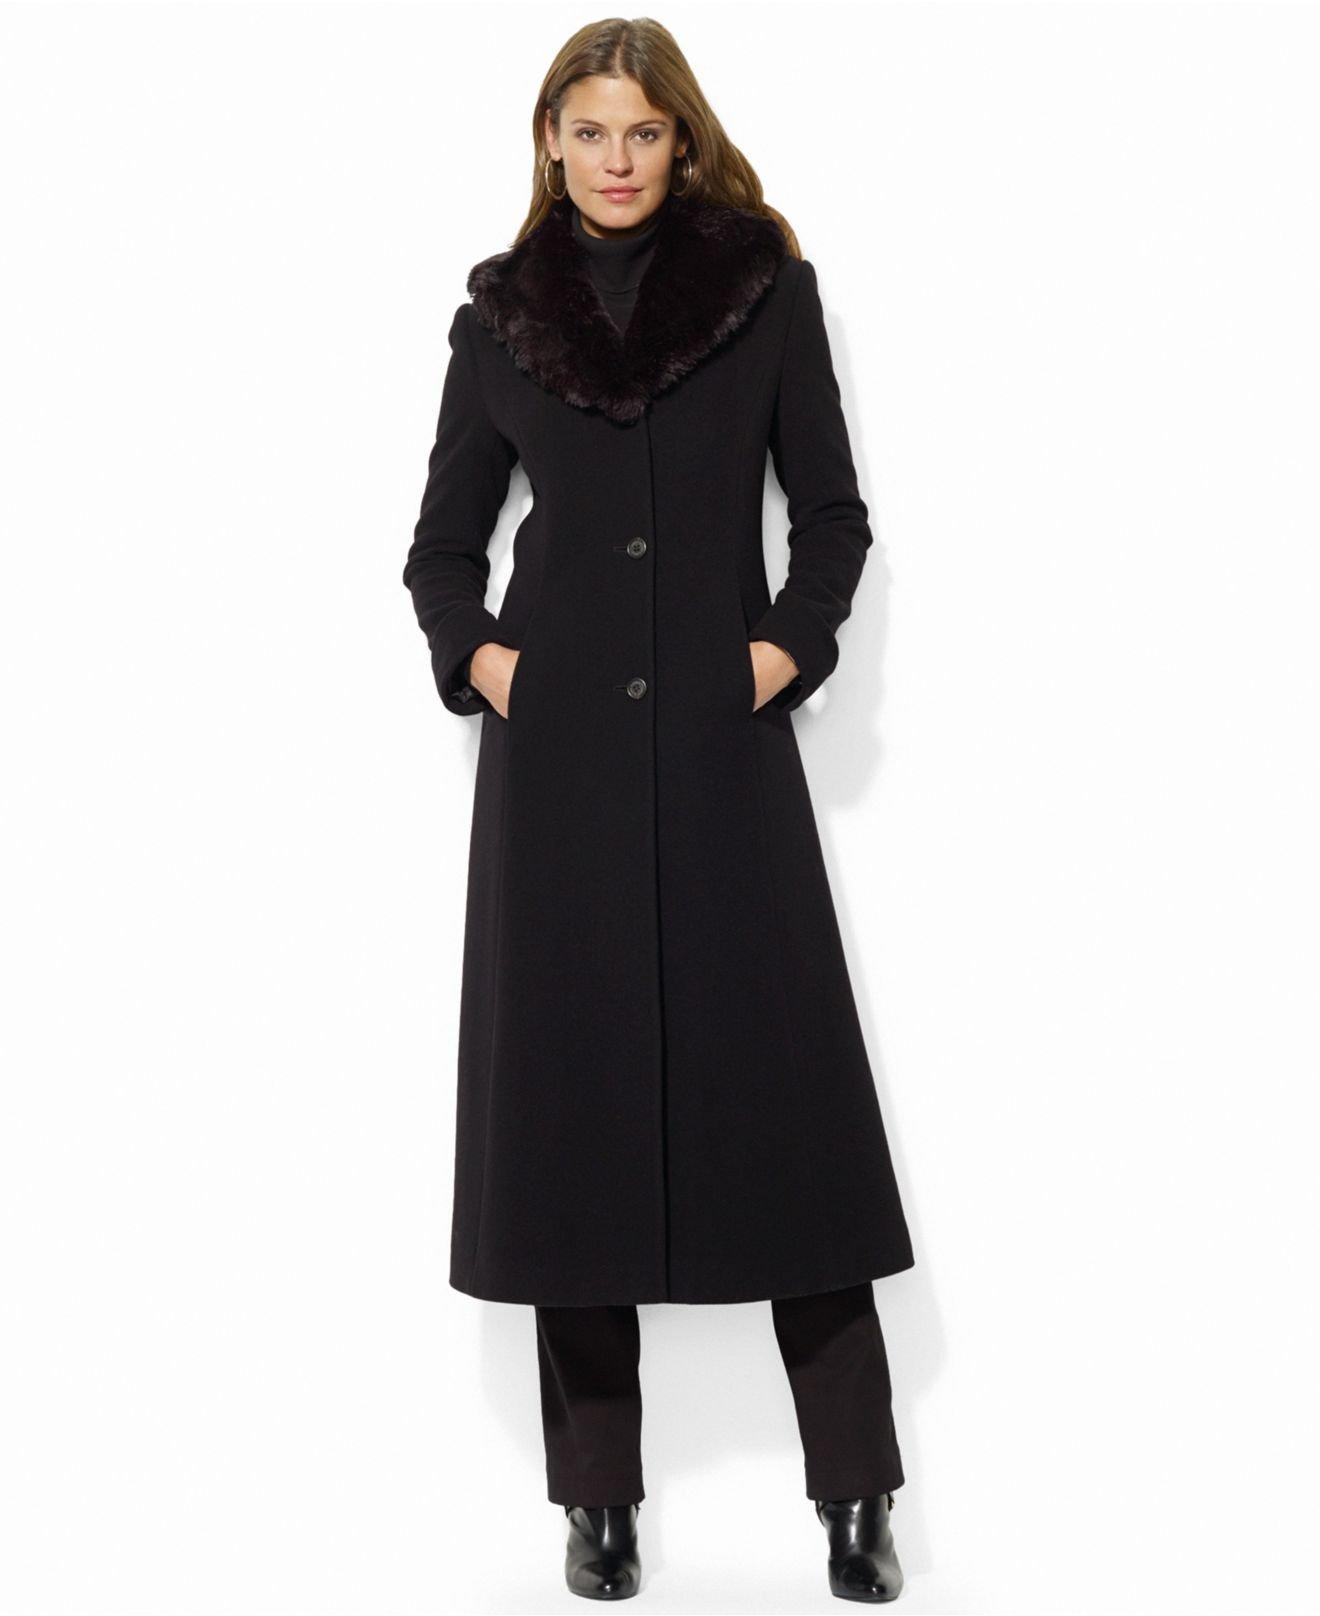 Lauren by ralph lauren Wool-Cashmere-Blend Faux-Fur-Collar Maxi ...